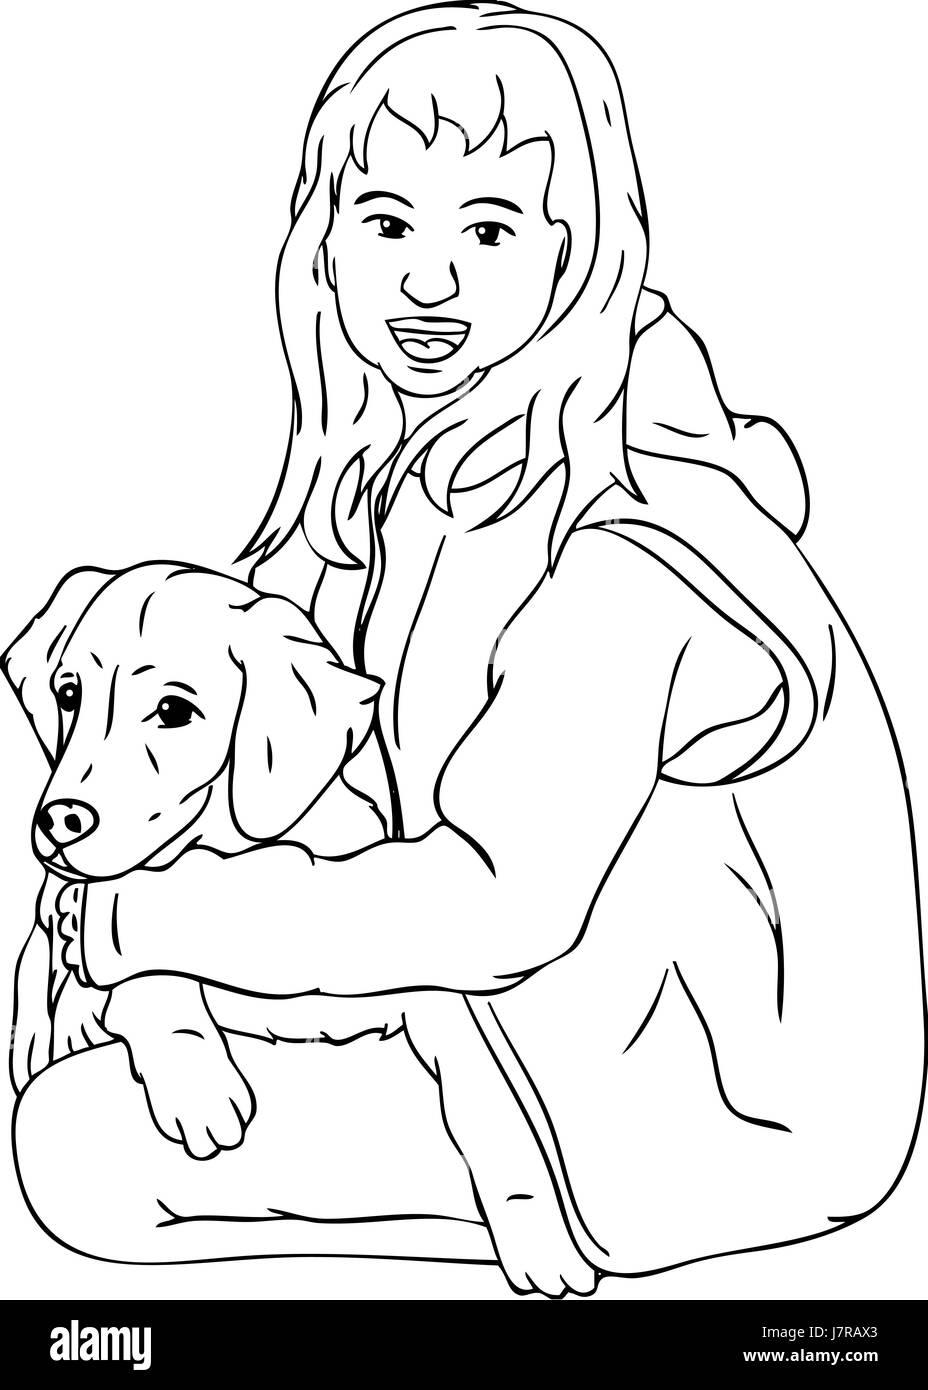 Isolated Colour Dog Illustration Paint Draw Cartoon Girl Girls Woman Stock Photo Alamy